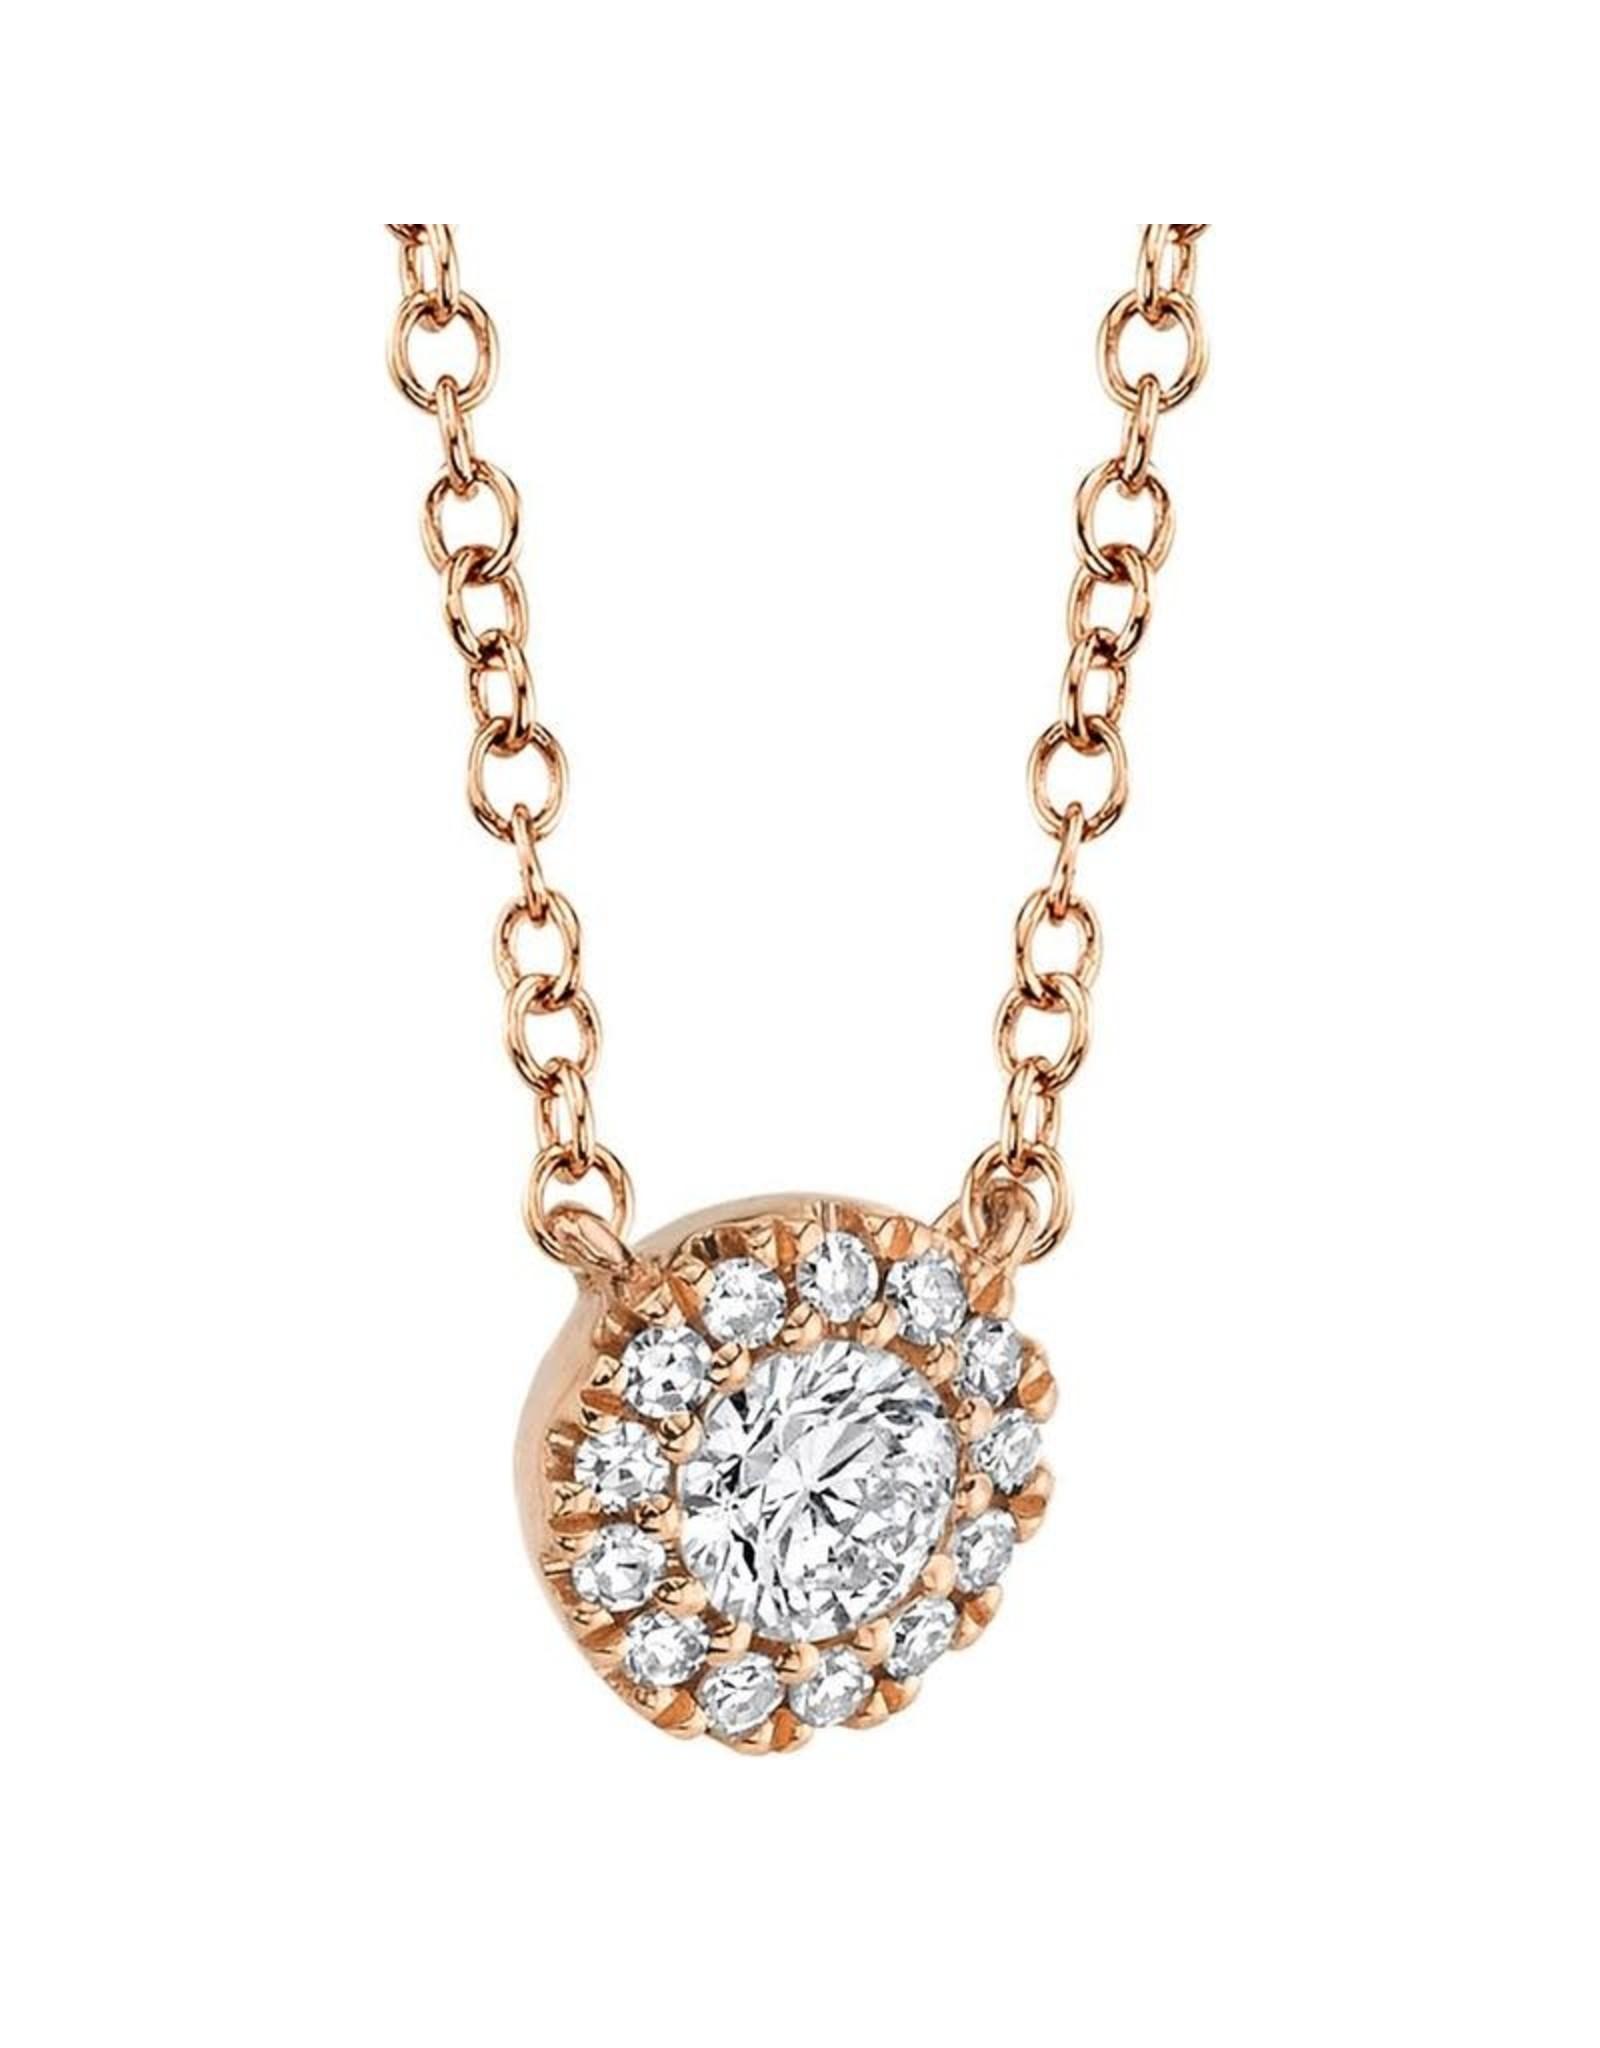 14K Rose Gold Diamond Halo Necklace, D: 0.14ct